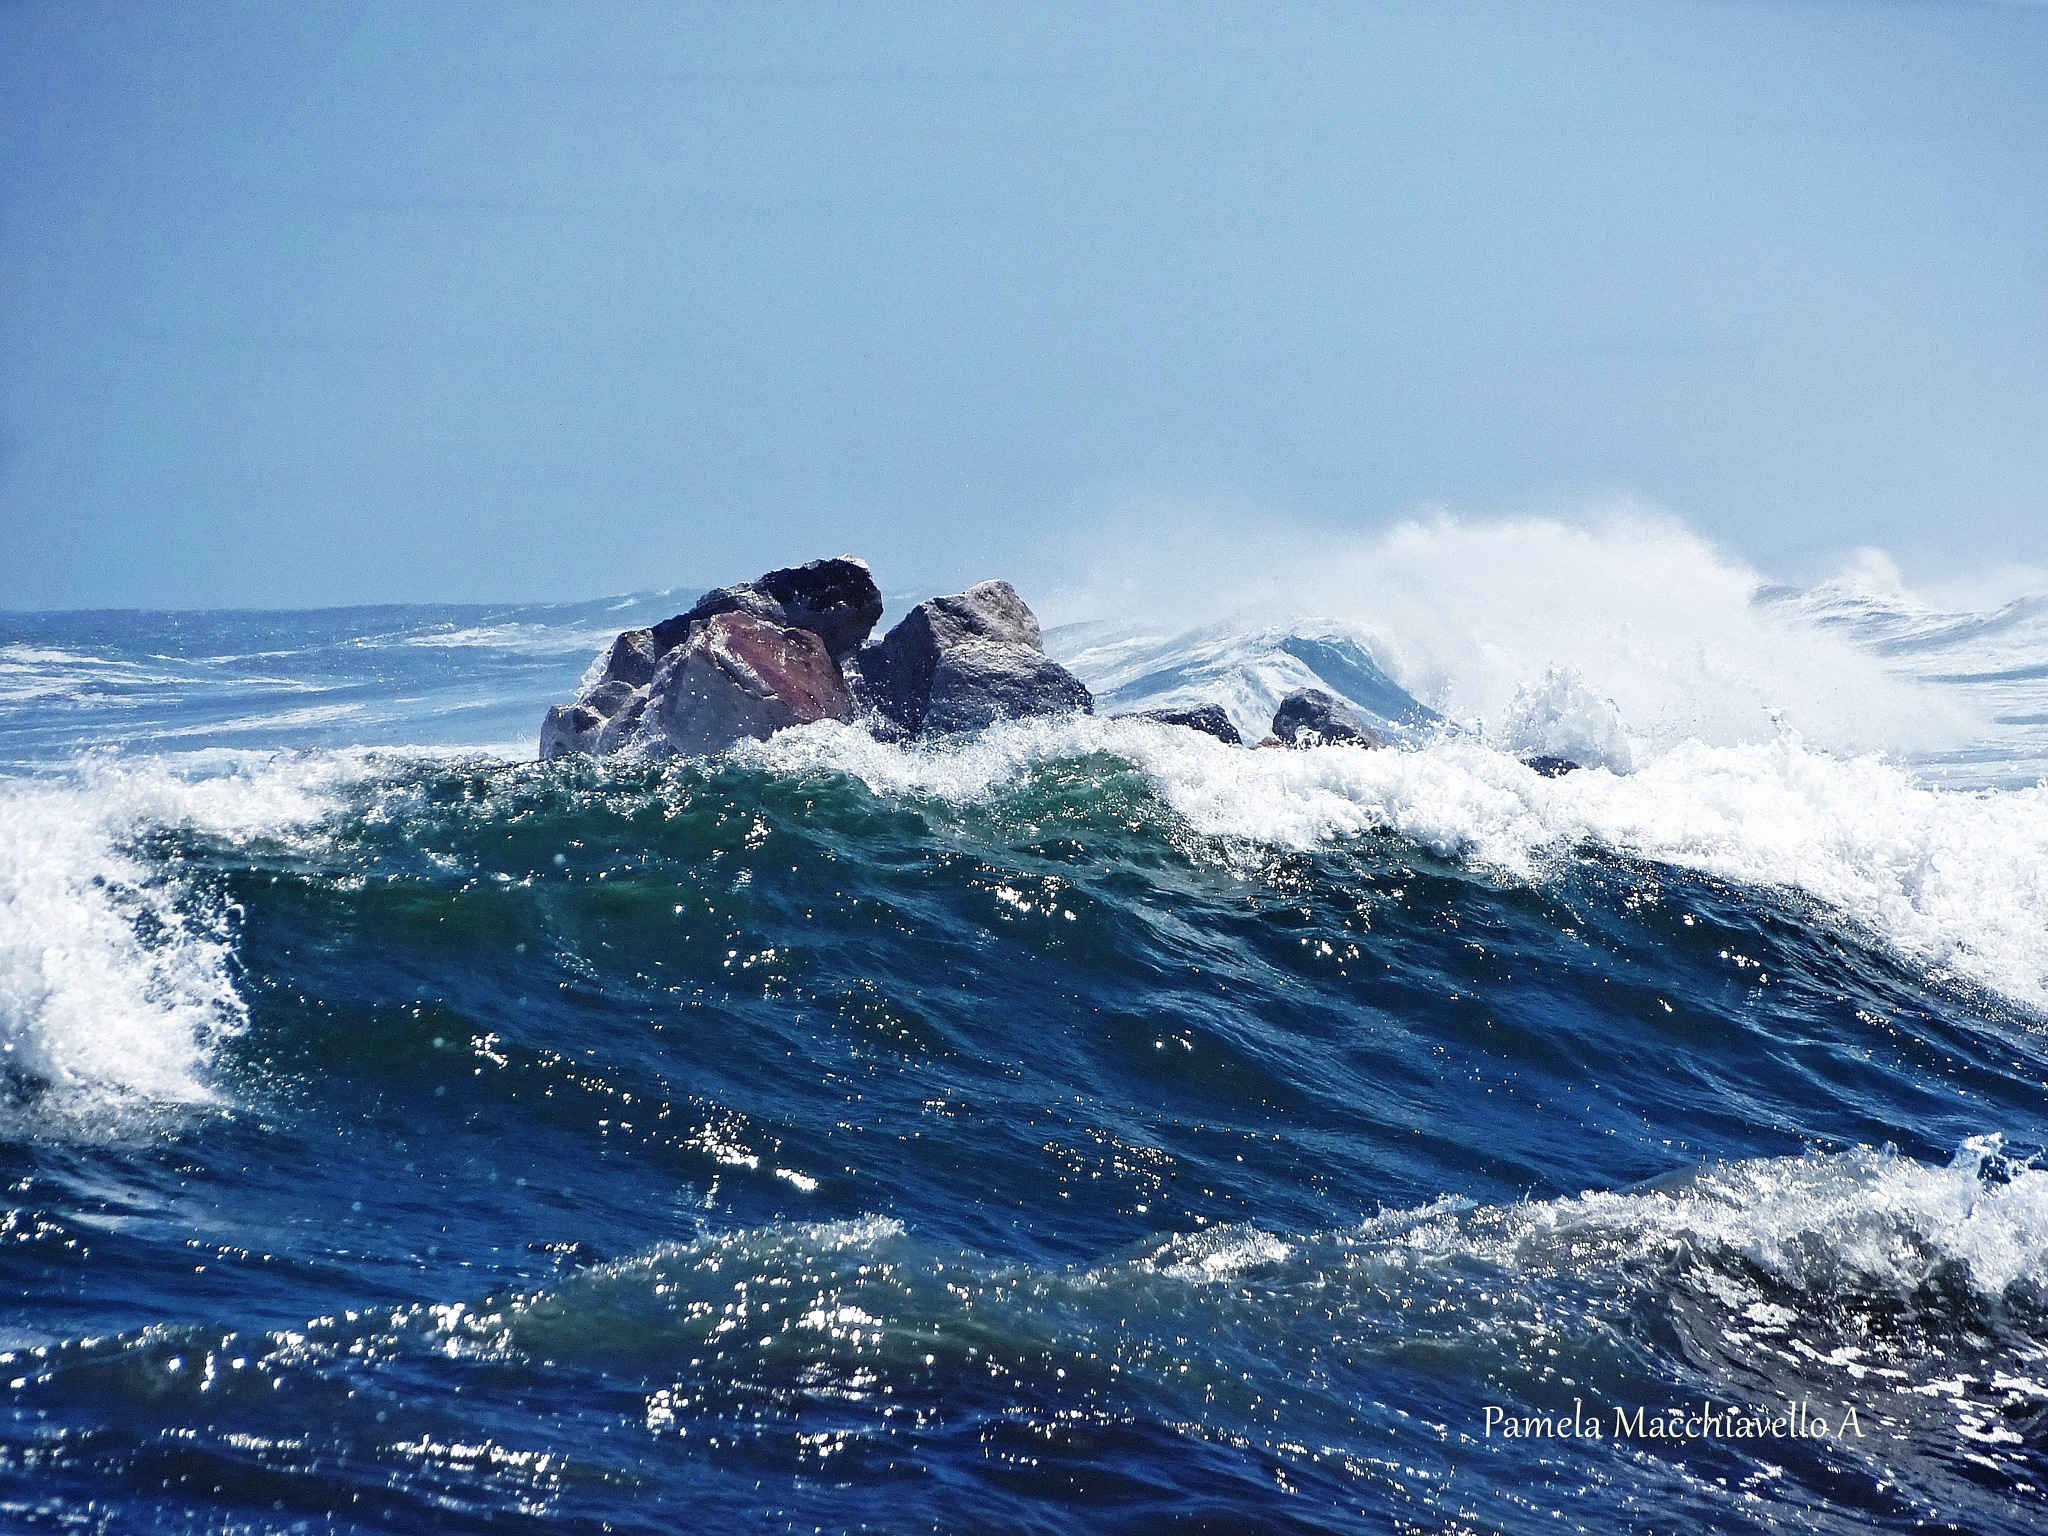 Mar agitado by Pamela Macc